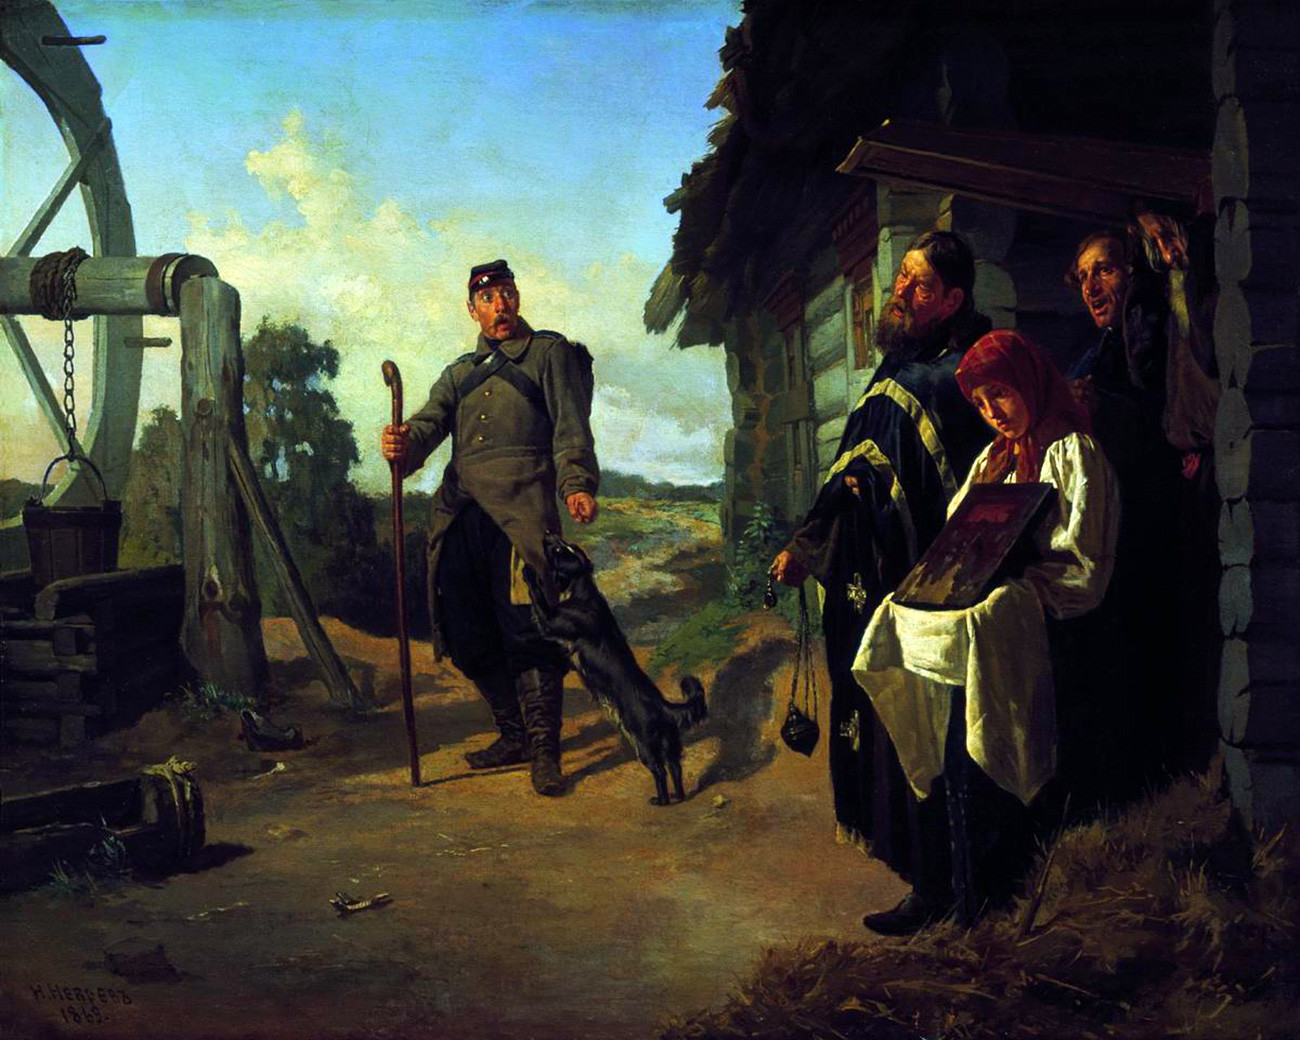 Regresso de soldado a sua pátria, 1869